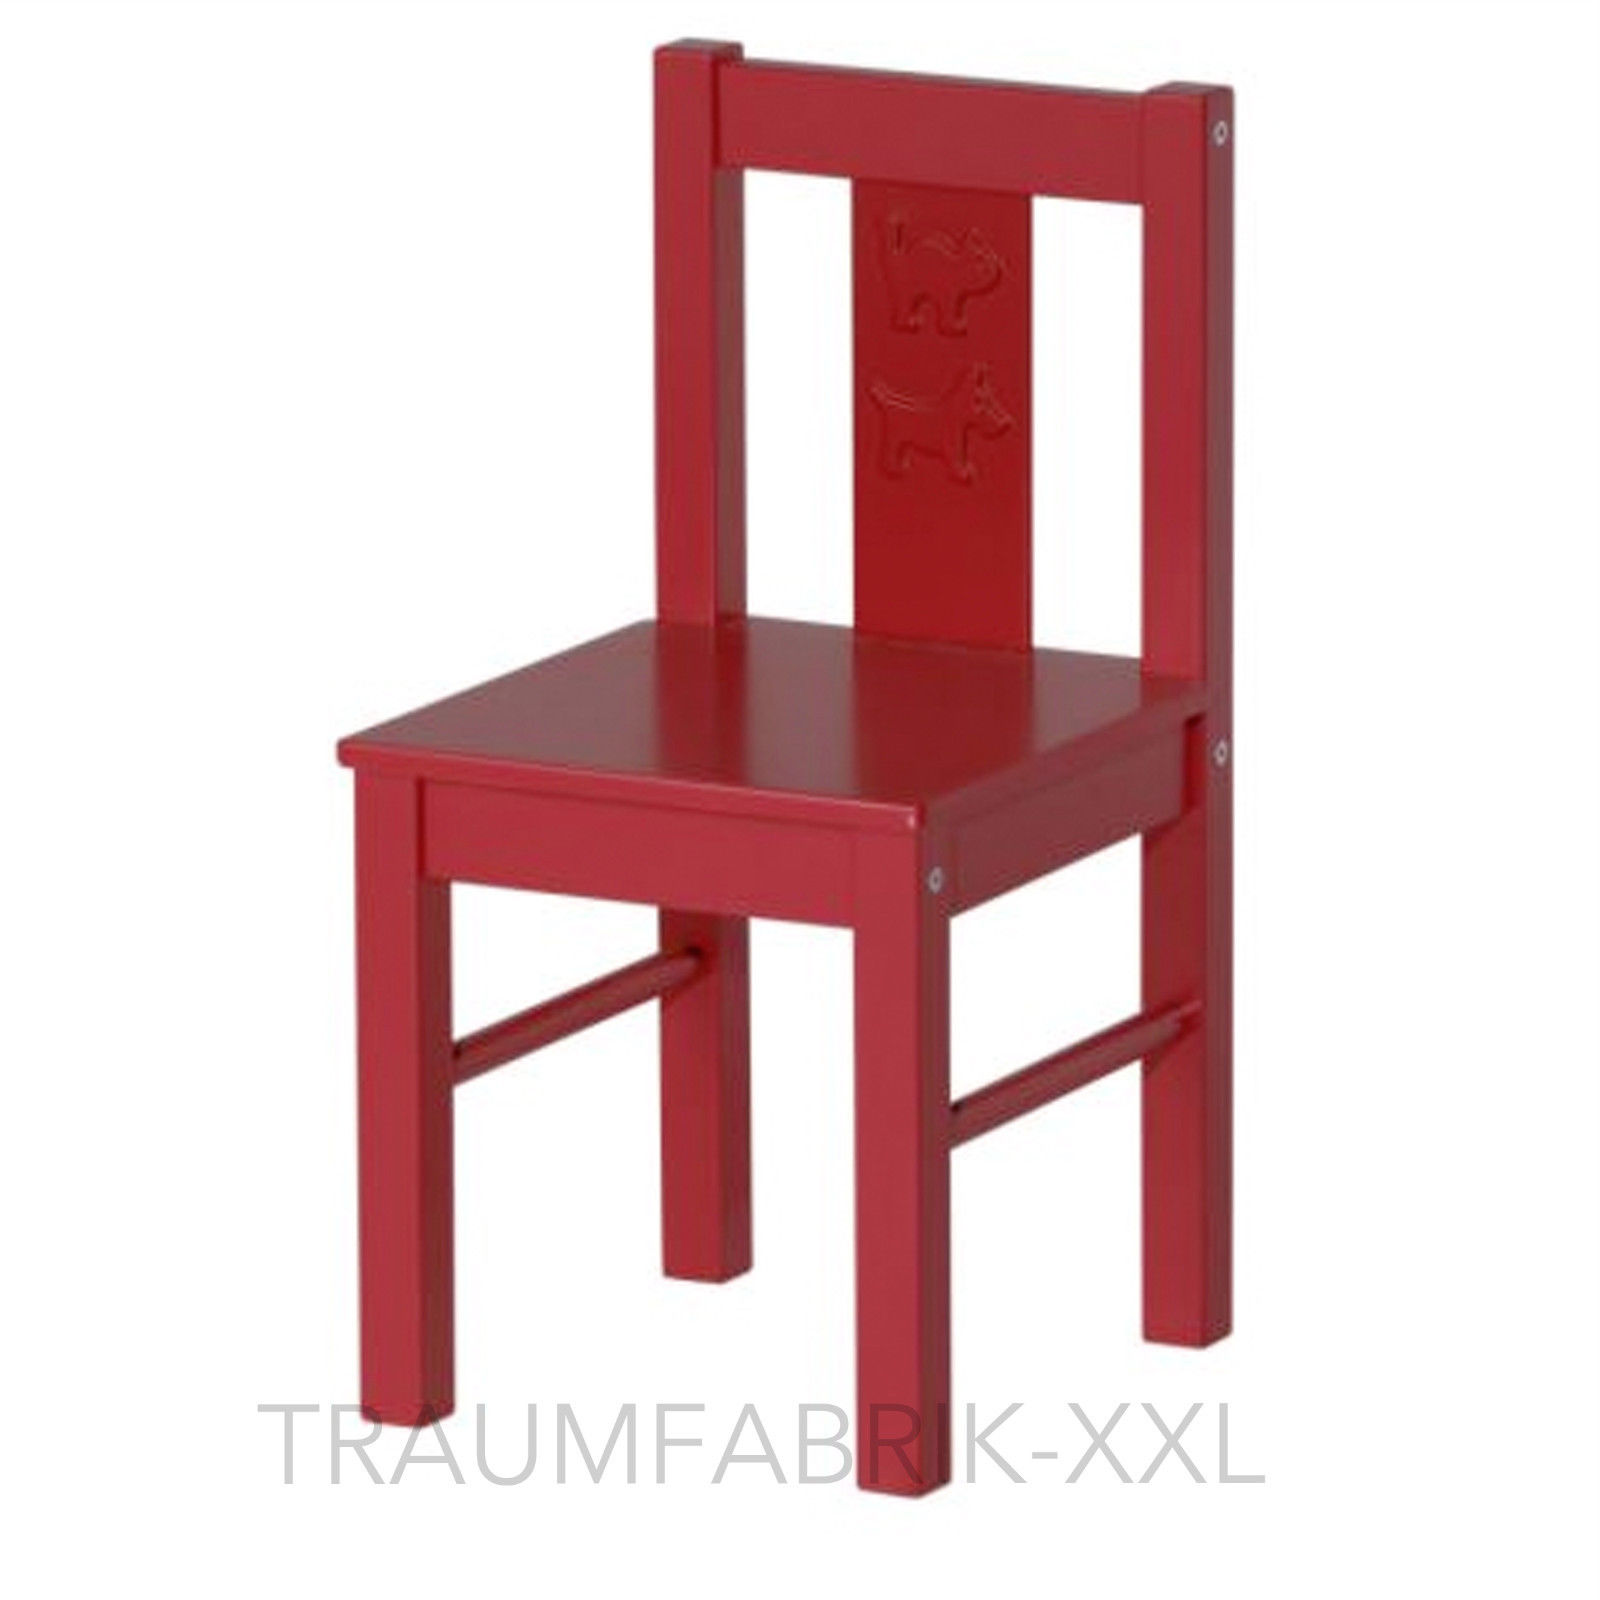 IKEA KRITTER Kinderstuhl Stuhl Kinderzimmer Holzstuhl rot Sitzhöhe ...